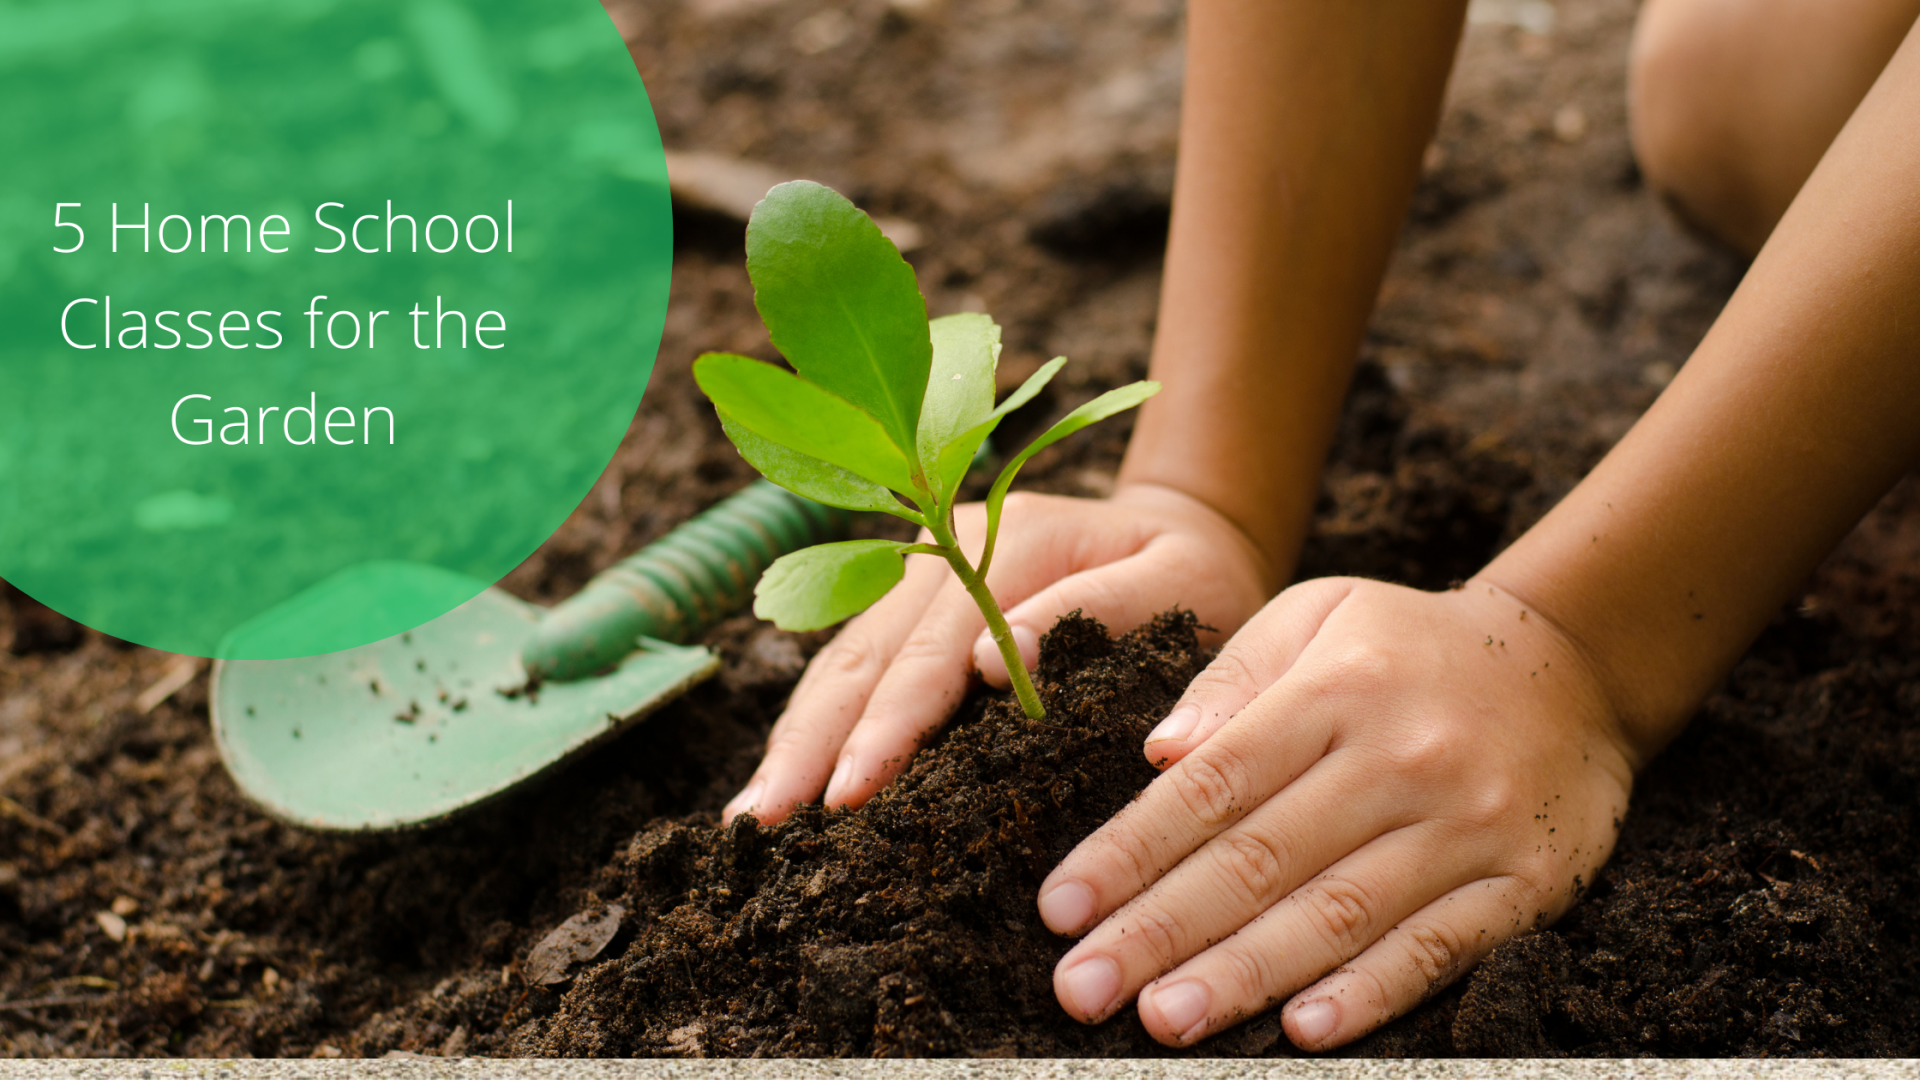 5 Homeschooling Classes for the Garden